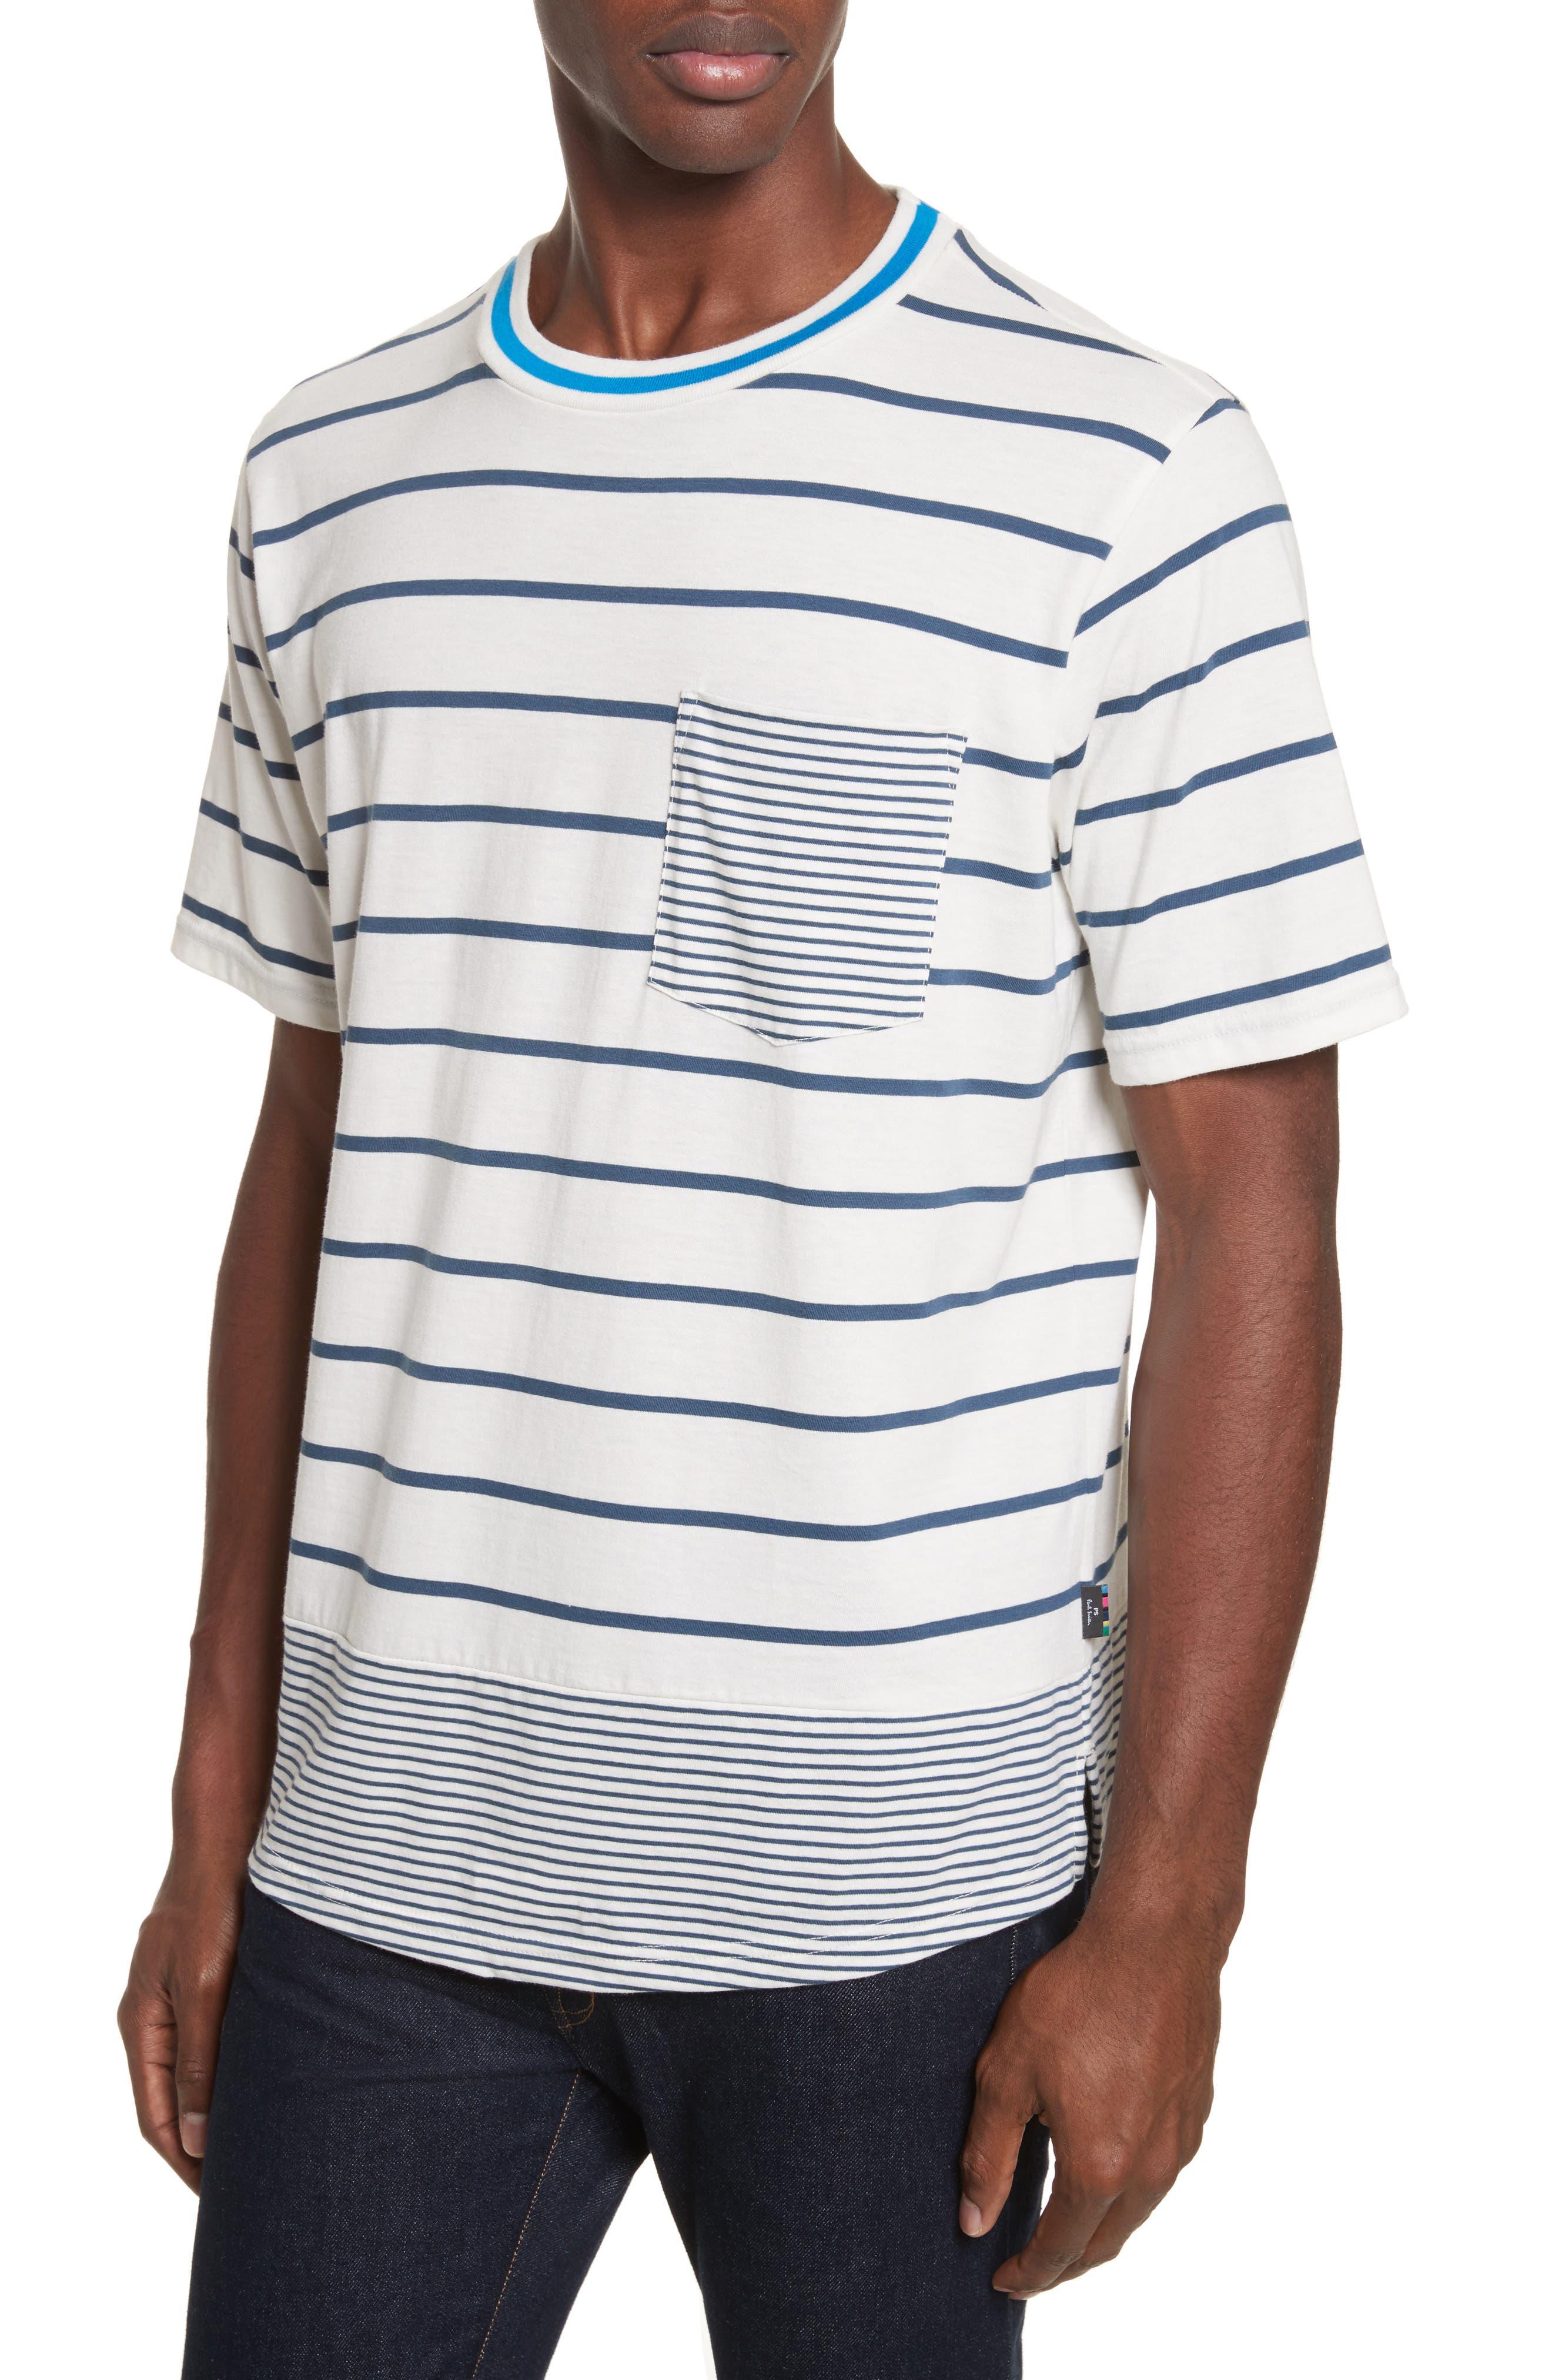 Mixed Stripe Pocket T-Shirt,                             Alternate thumbnail 4, color,                             435